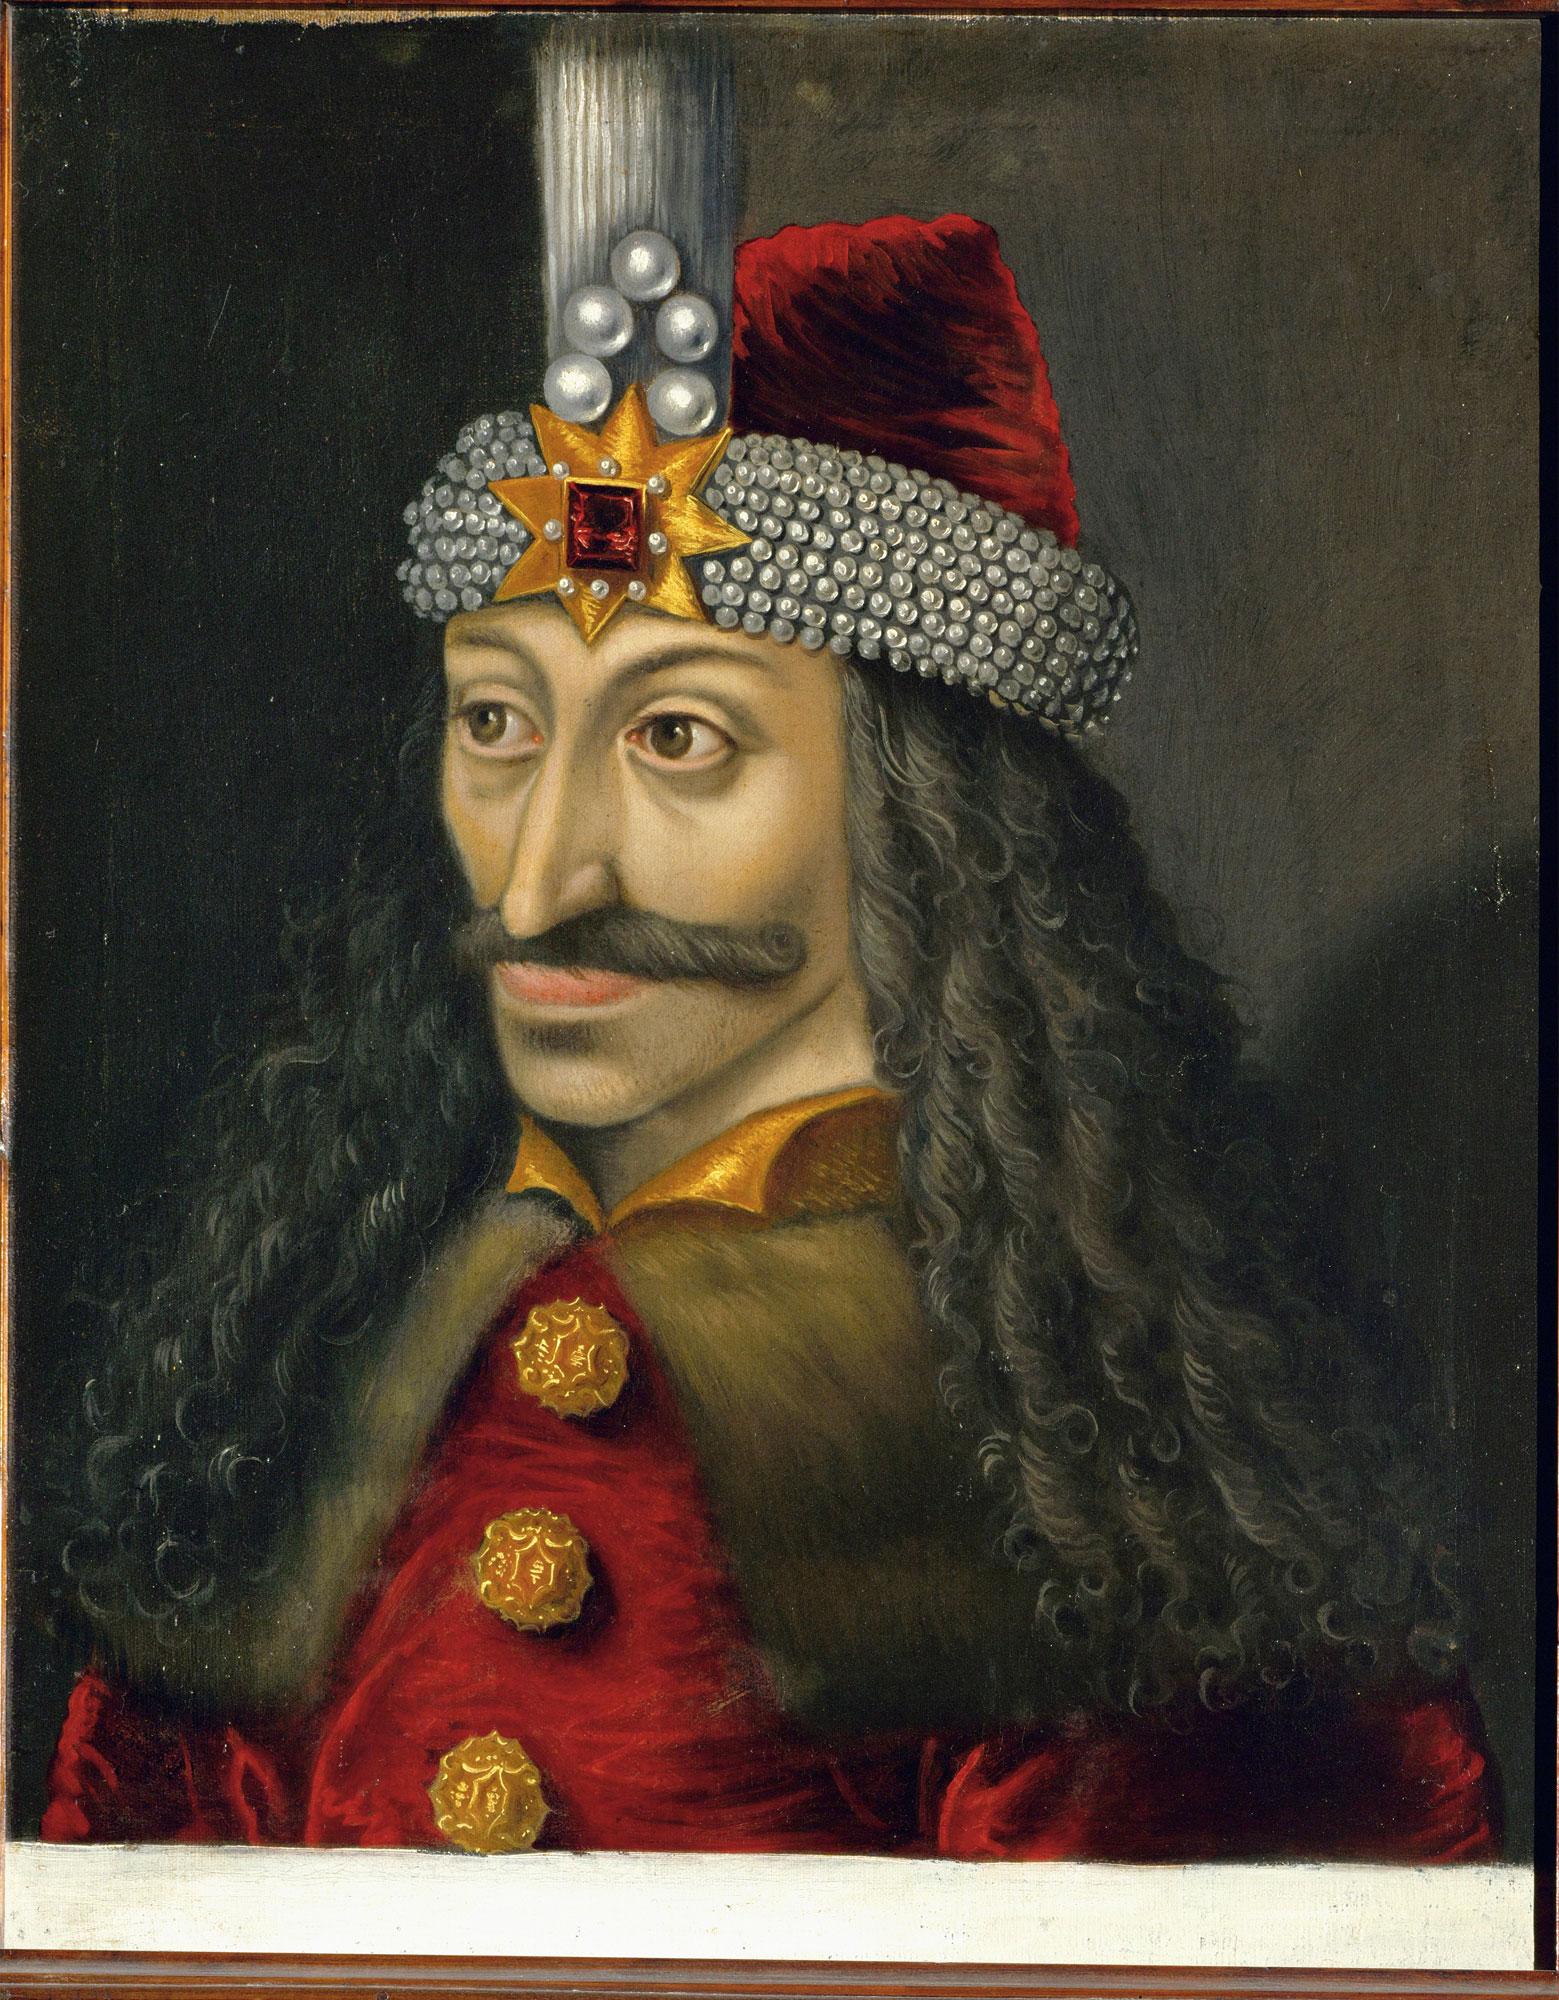 15th century portrait of Vlad III, Prince of Wallachia